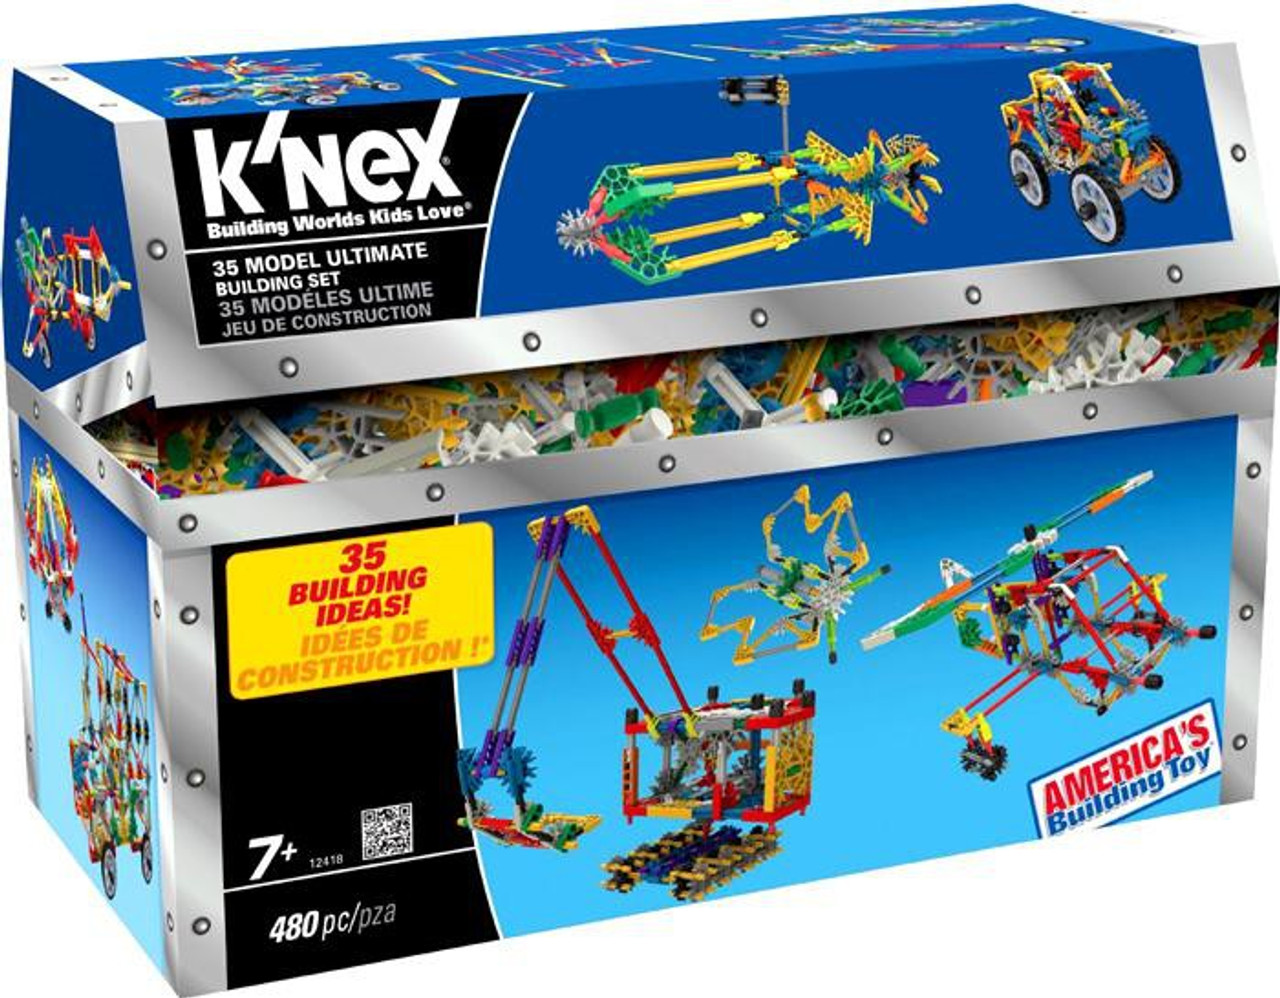 K'Nex 35 Model Ultimate Set #12418